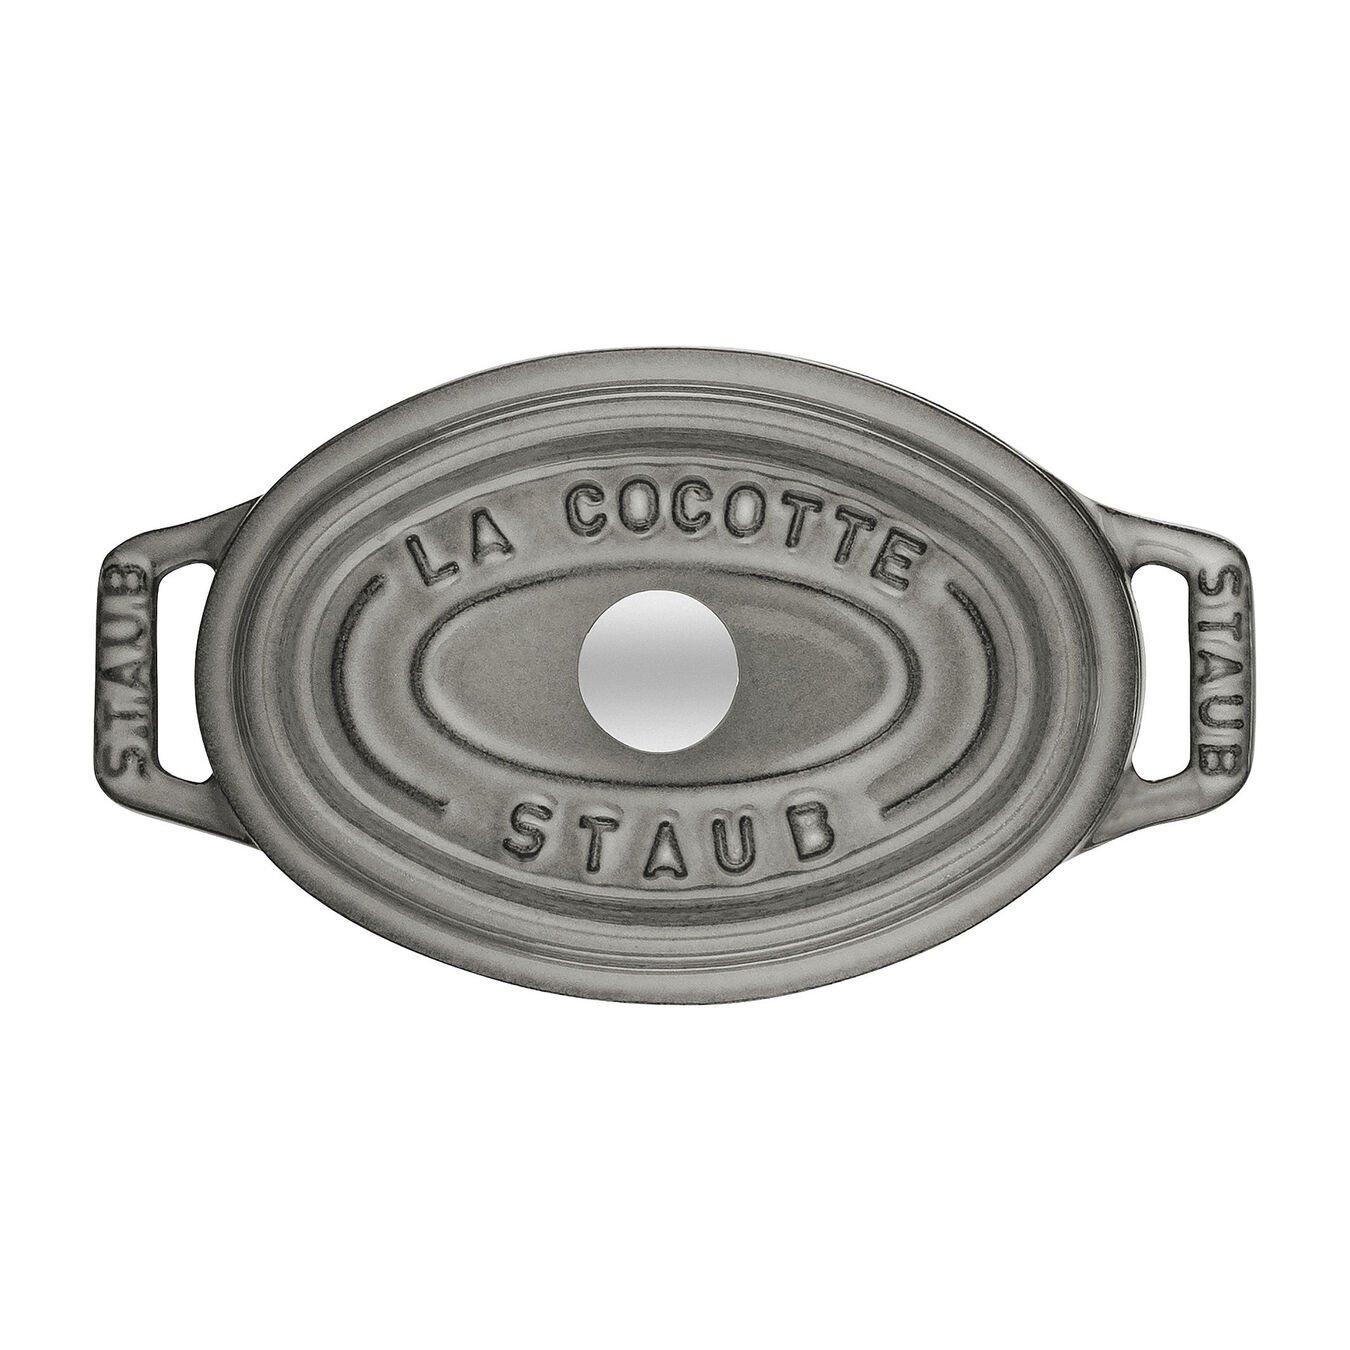 Mini Cocotte 11 cm, oval, Graphit-Grau, Gusseisen,,large 2